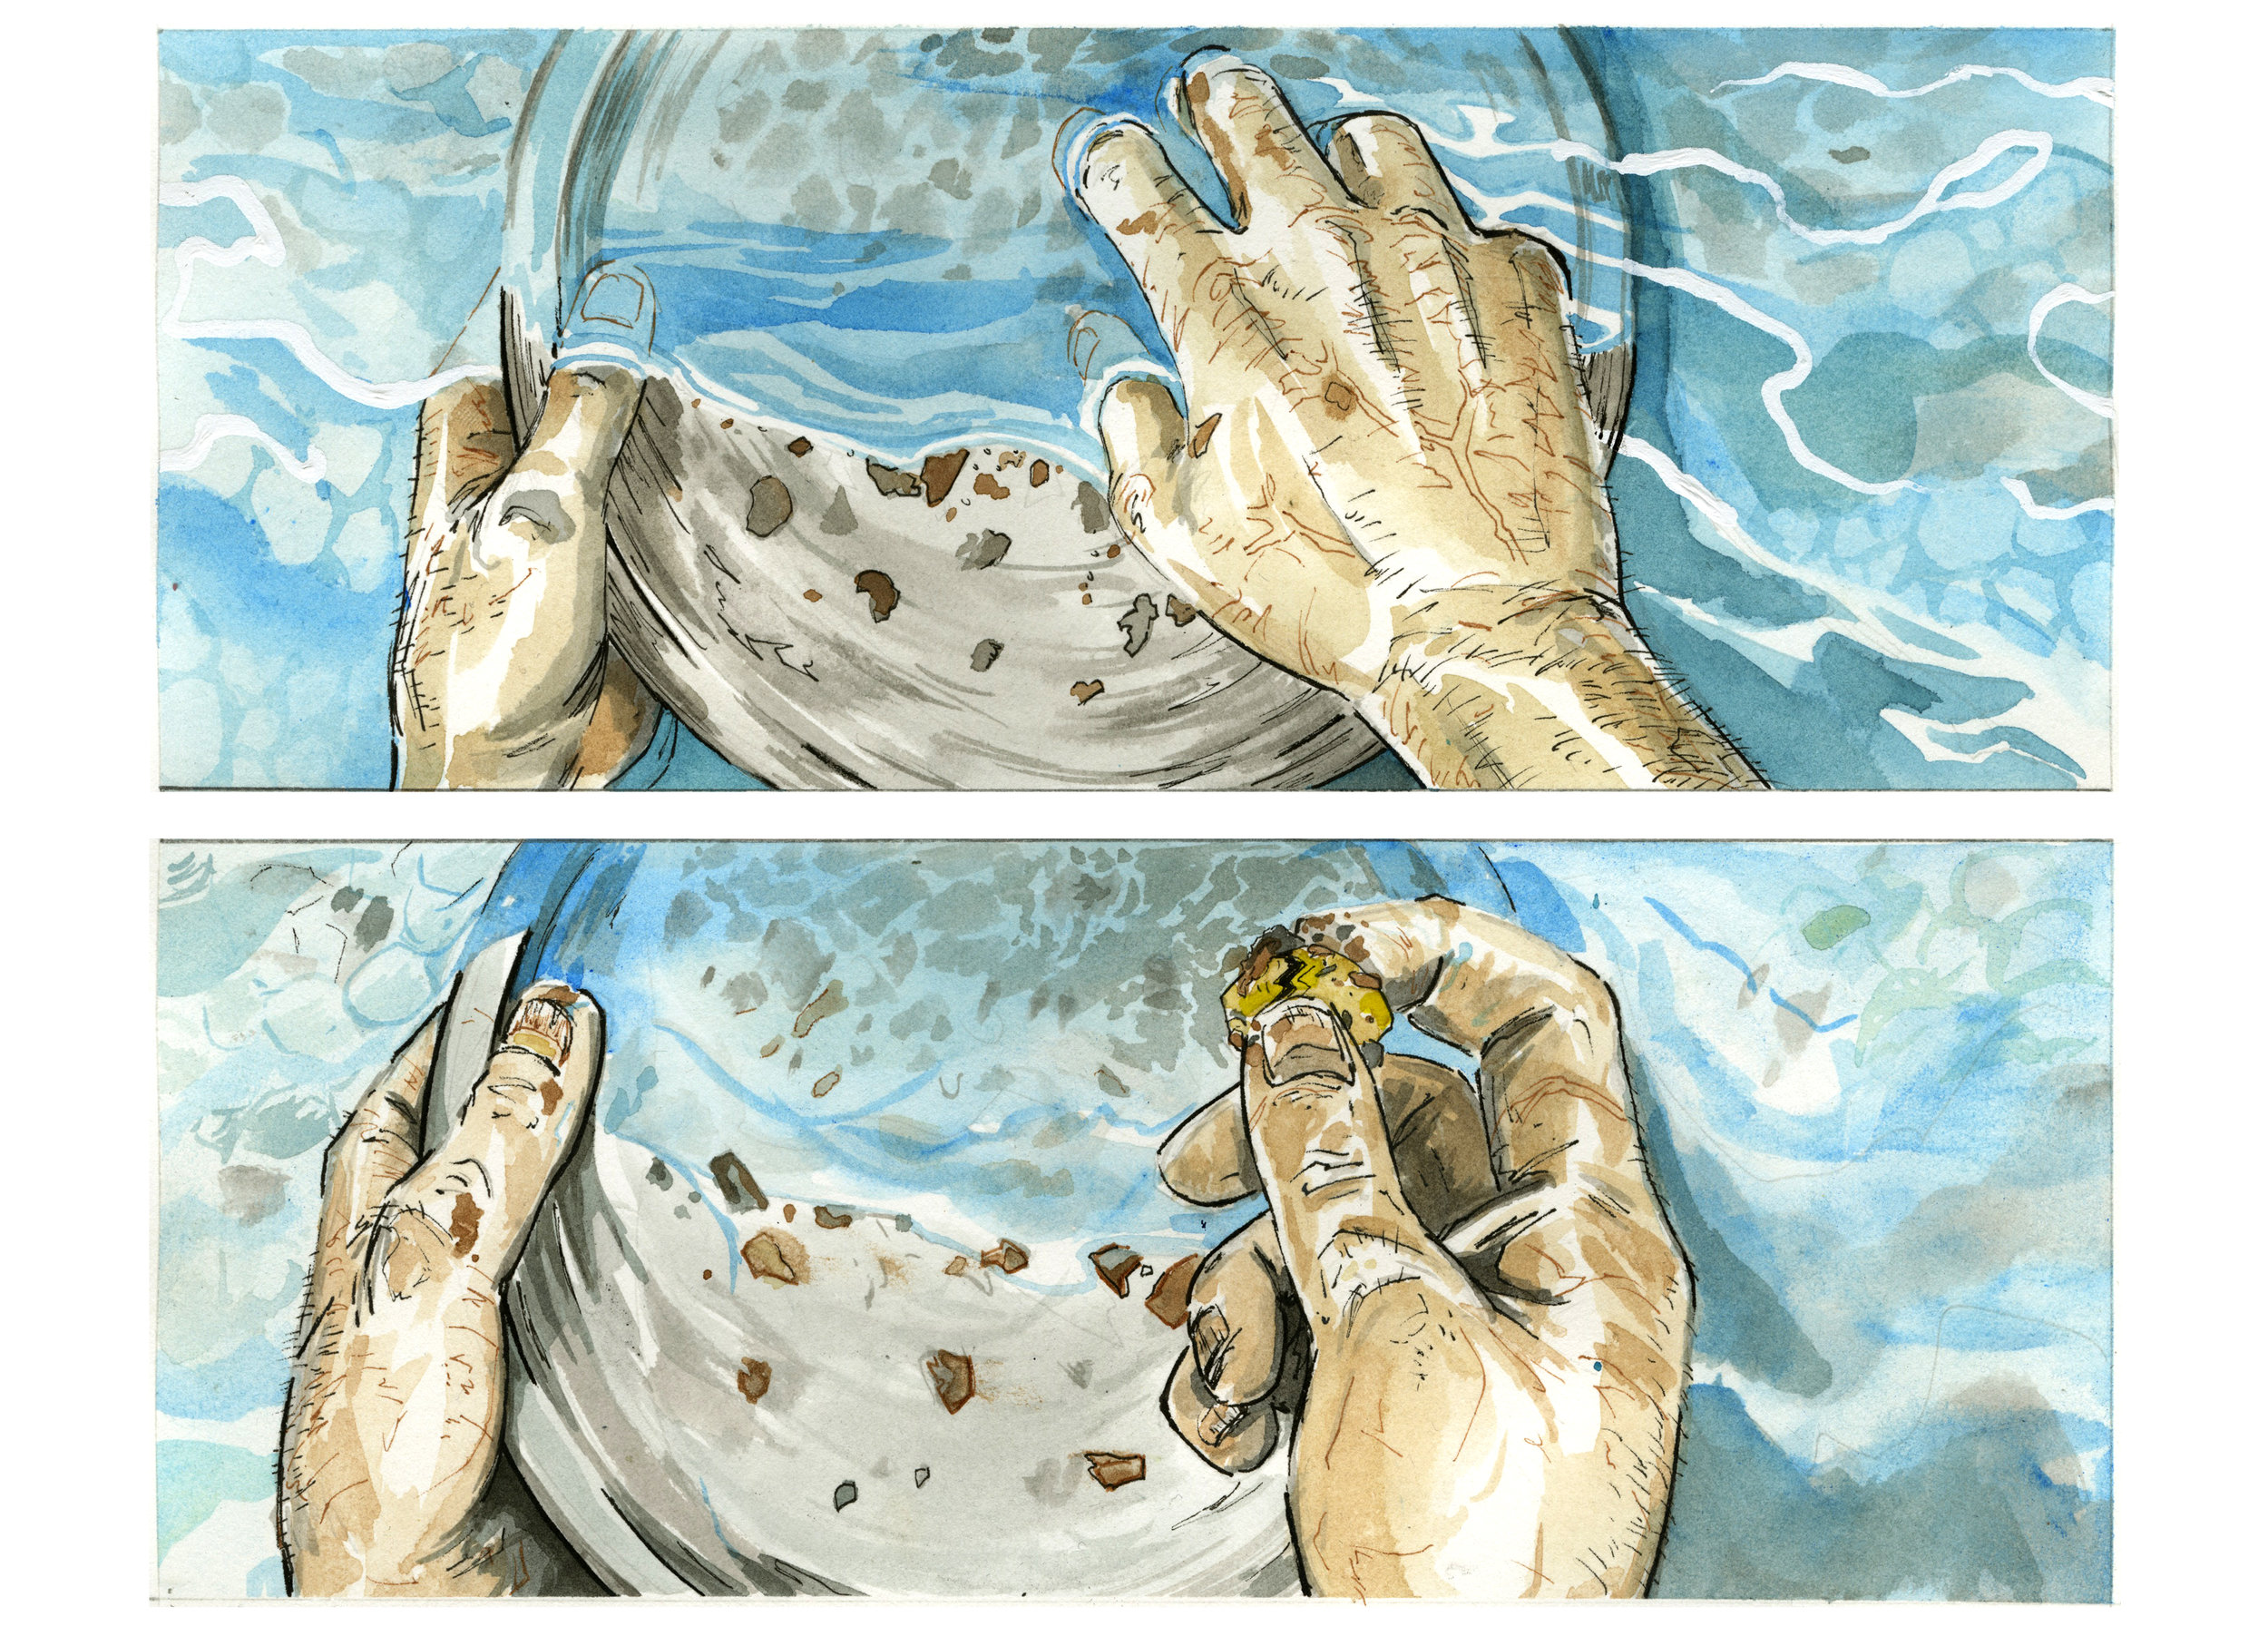 Watercolour comic panels